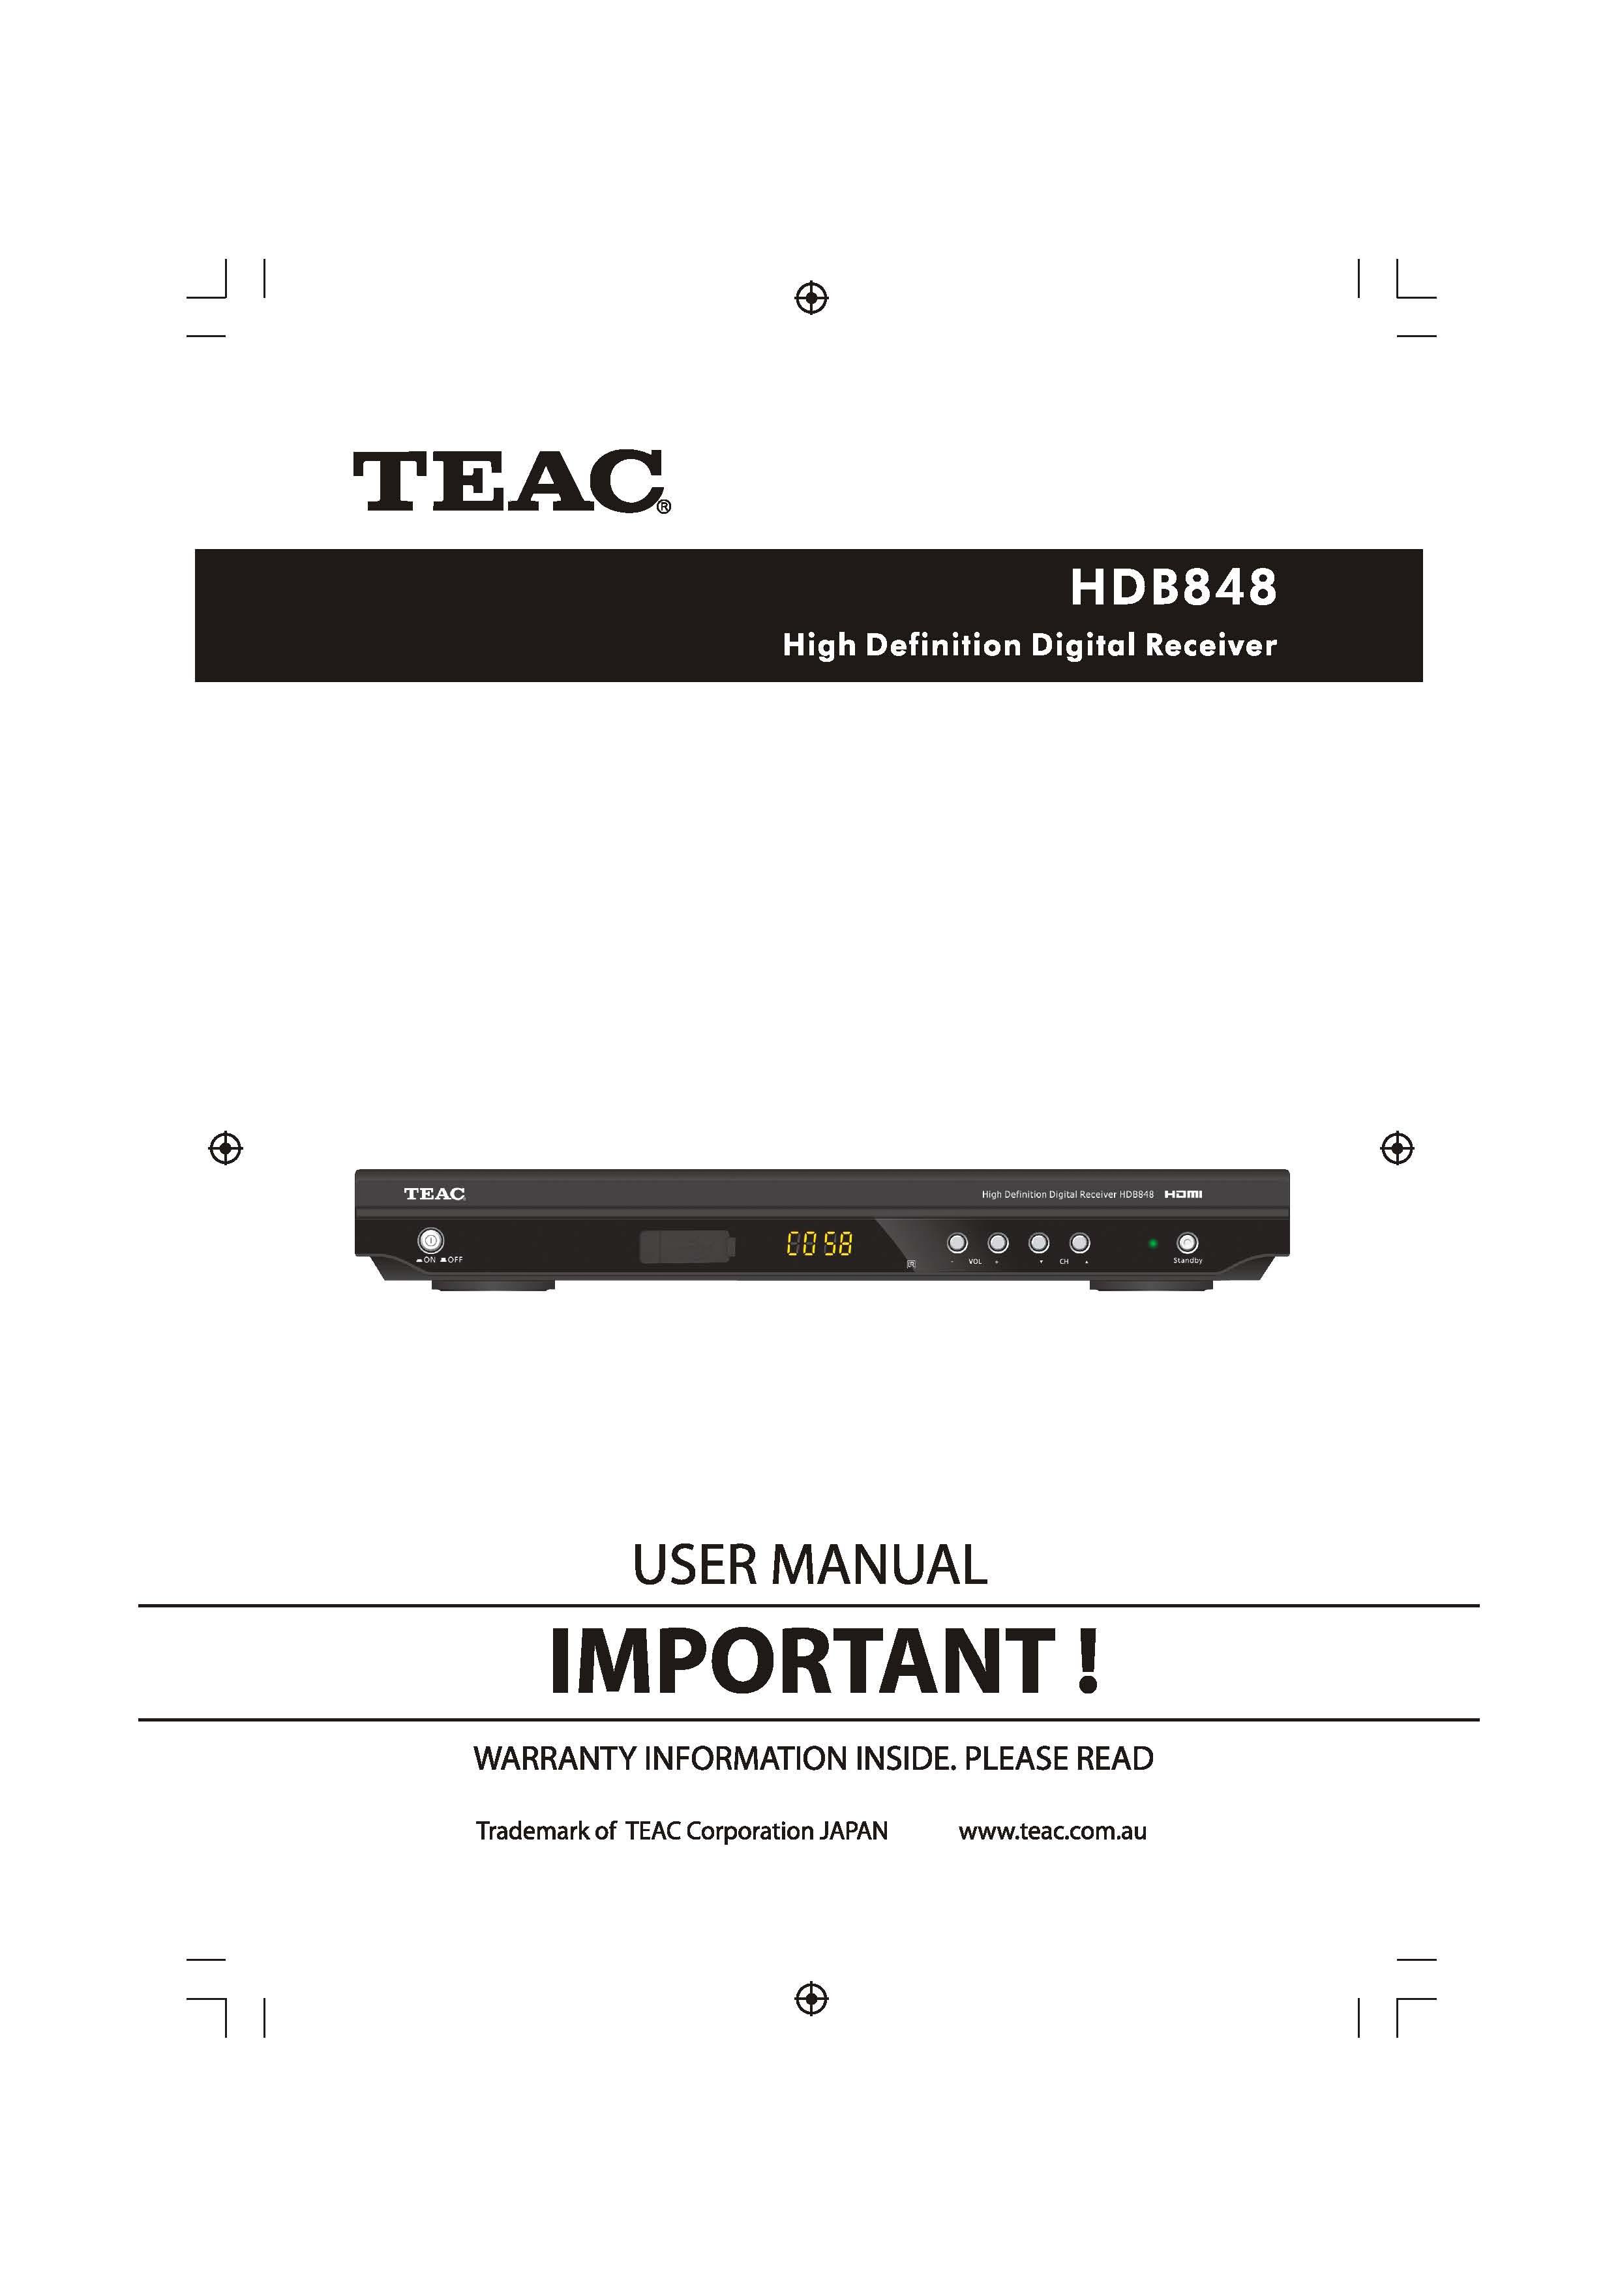 ... Array - teac hdb848 user manual u2014 store809 rh store809 com